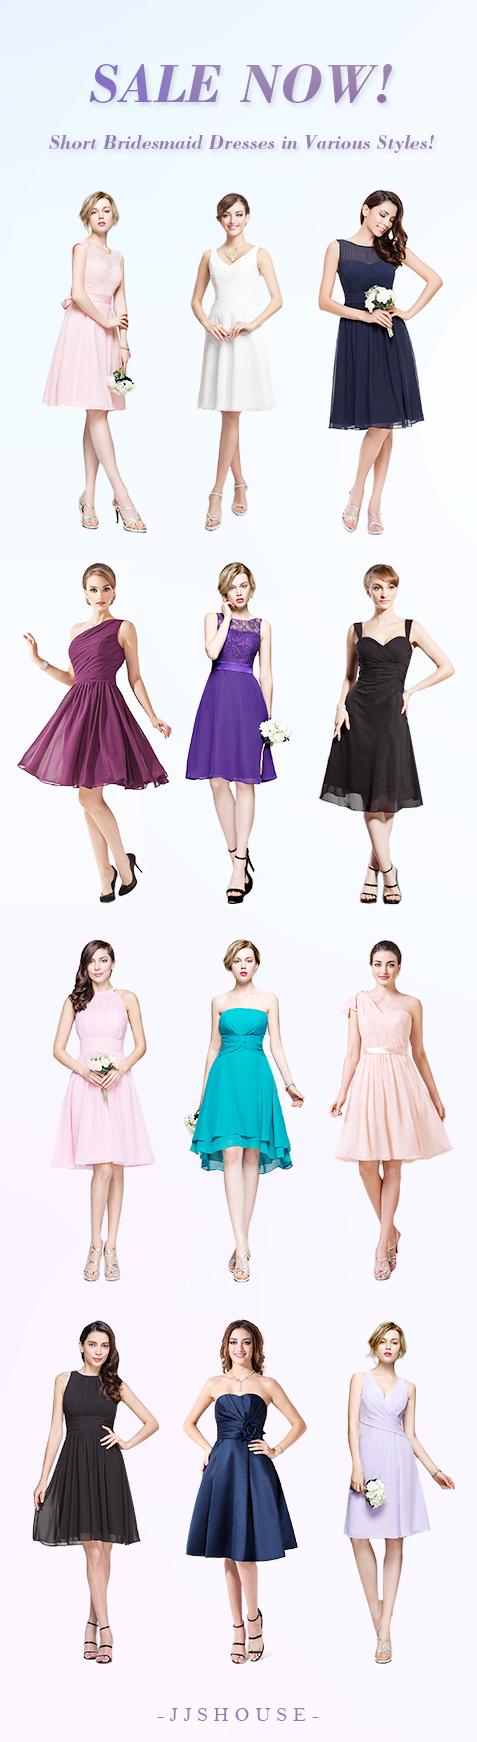 Bridesmaiddresses sale now short bridesmaid dresses in various